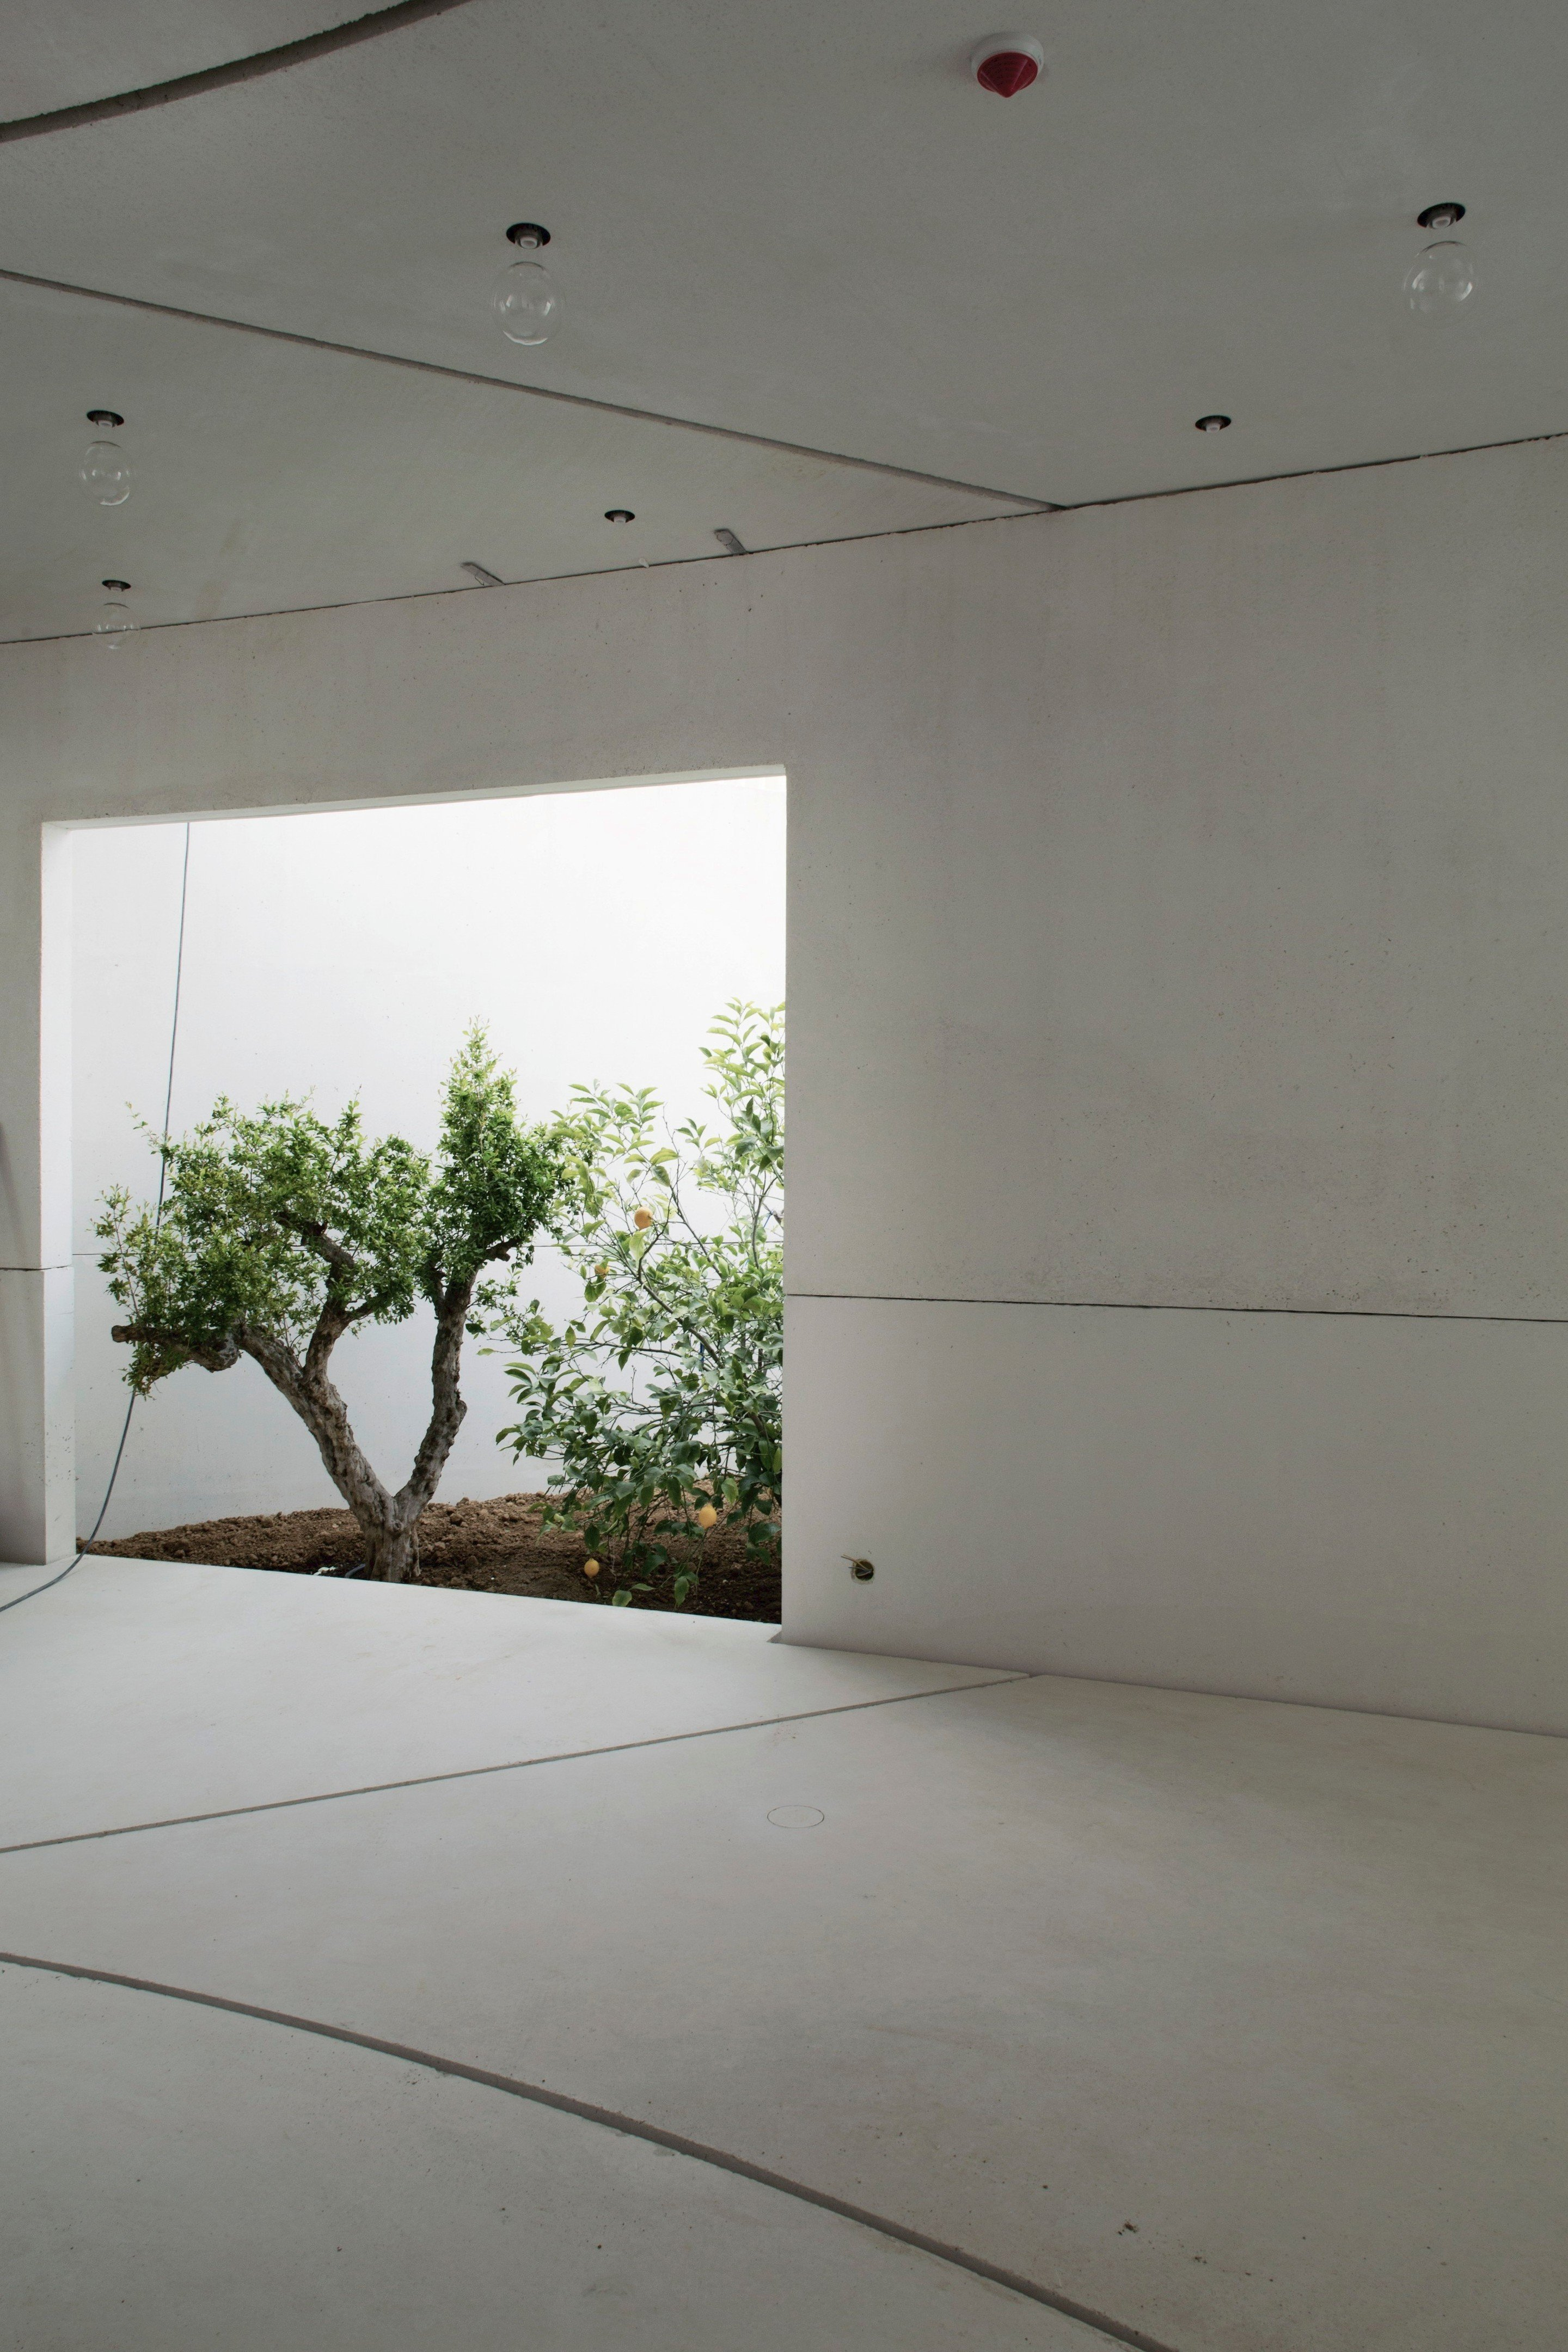 Studio Architettura Paesaggio Milano bahrain pavilion at expo milano 2015 | studio anne holtrop